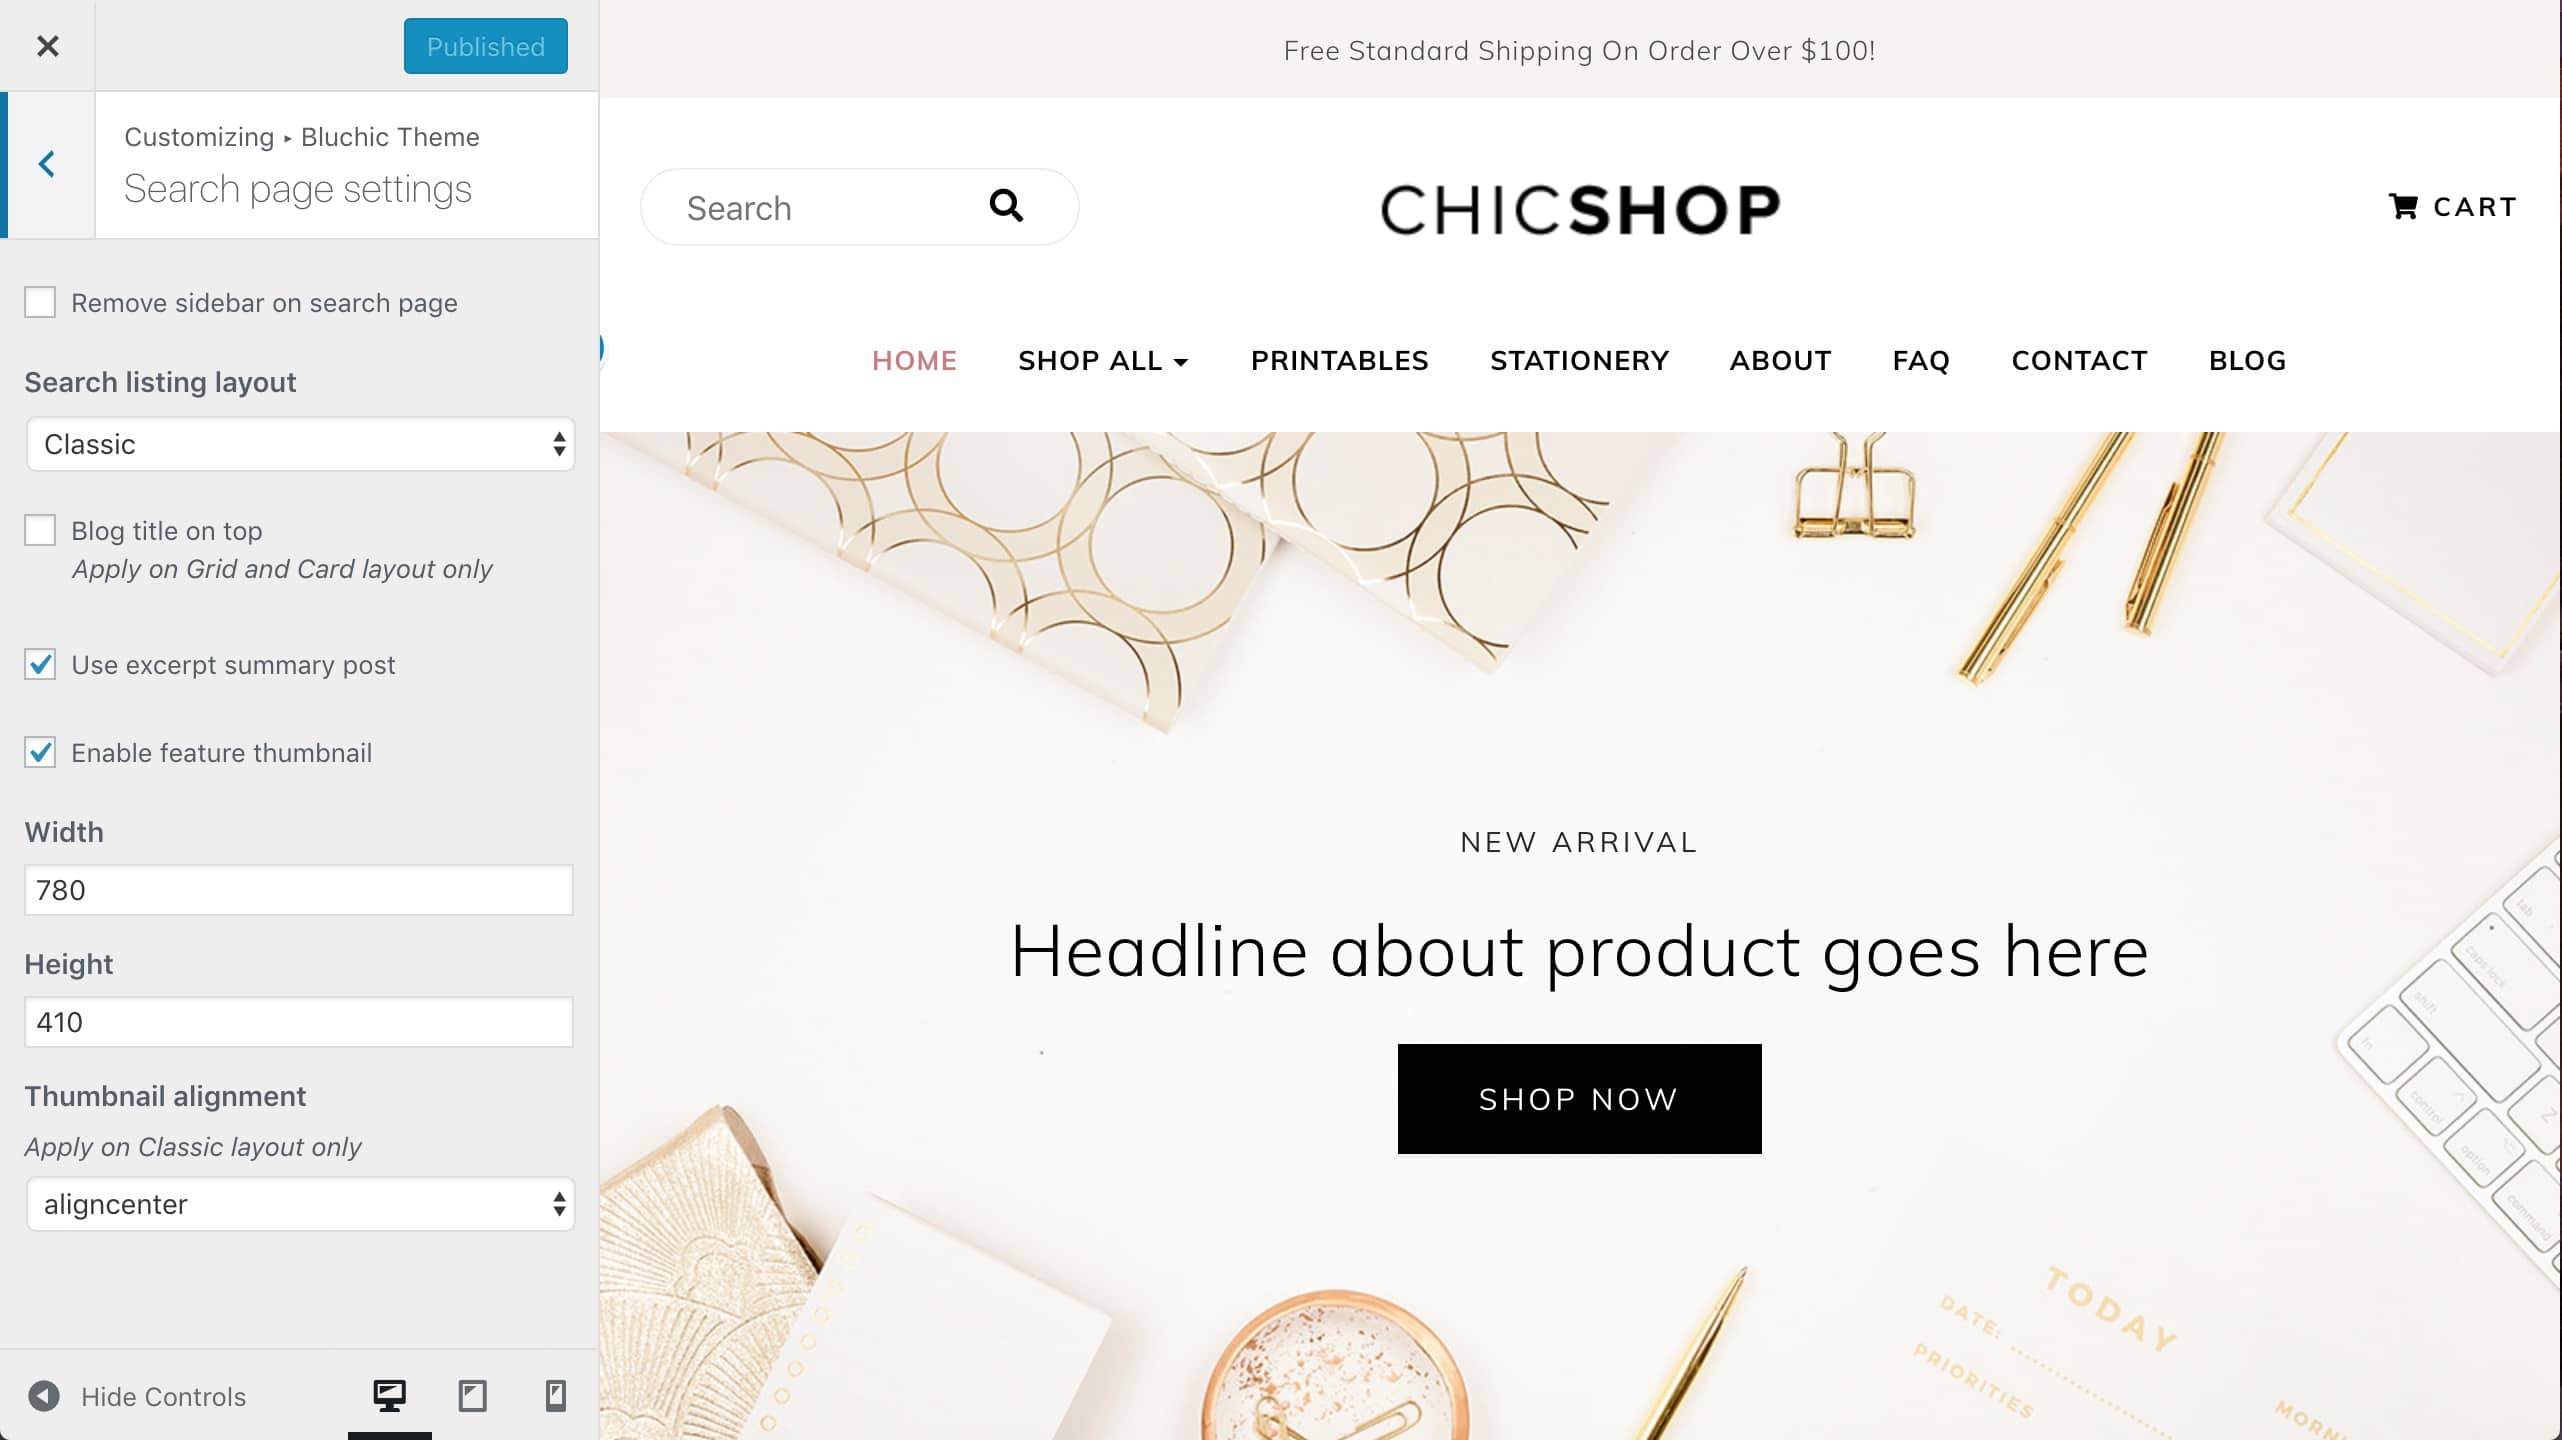 ChicShop search page settings